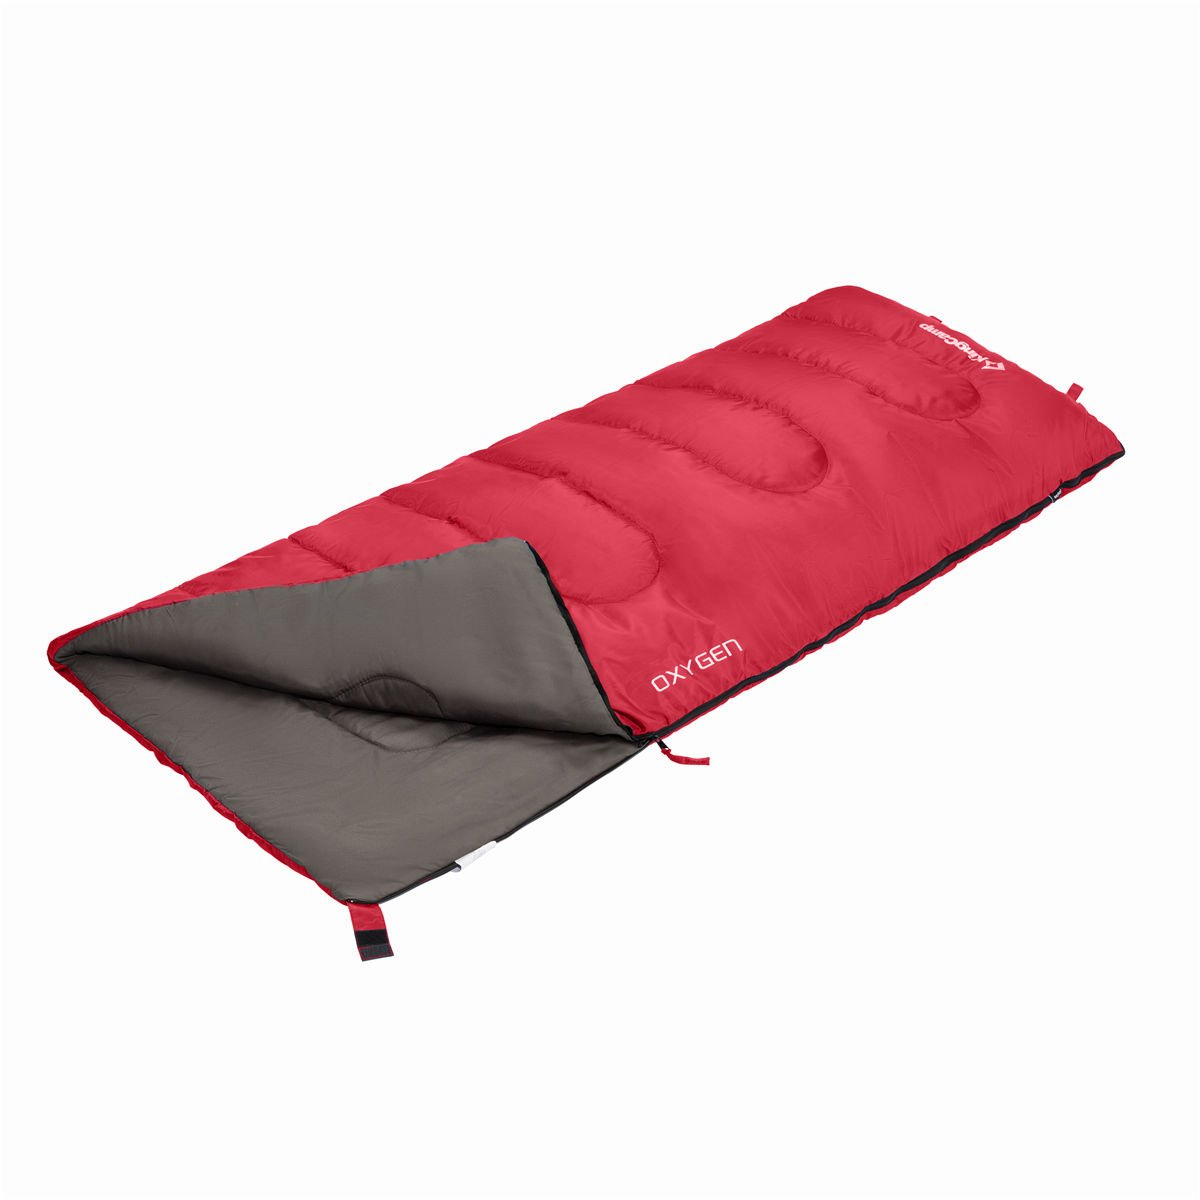 Oxygen 12 C / 53 F Lightweight Sleeping Bag Camping Backpacking 7429'' by Sleeping Bag